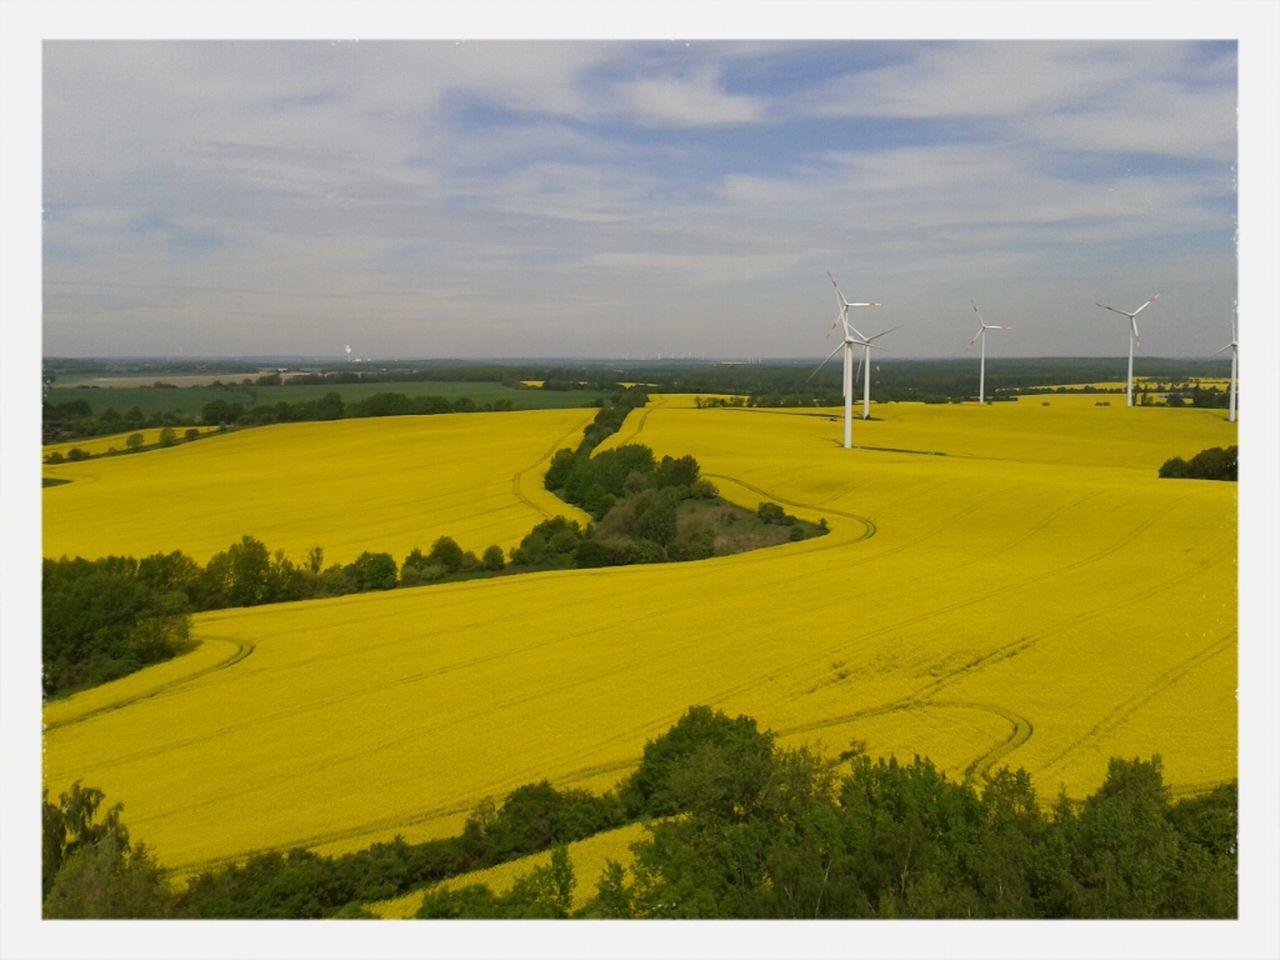 Landscape With Wind Turbines In Field